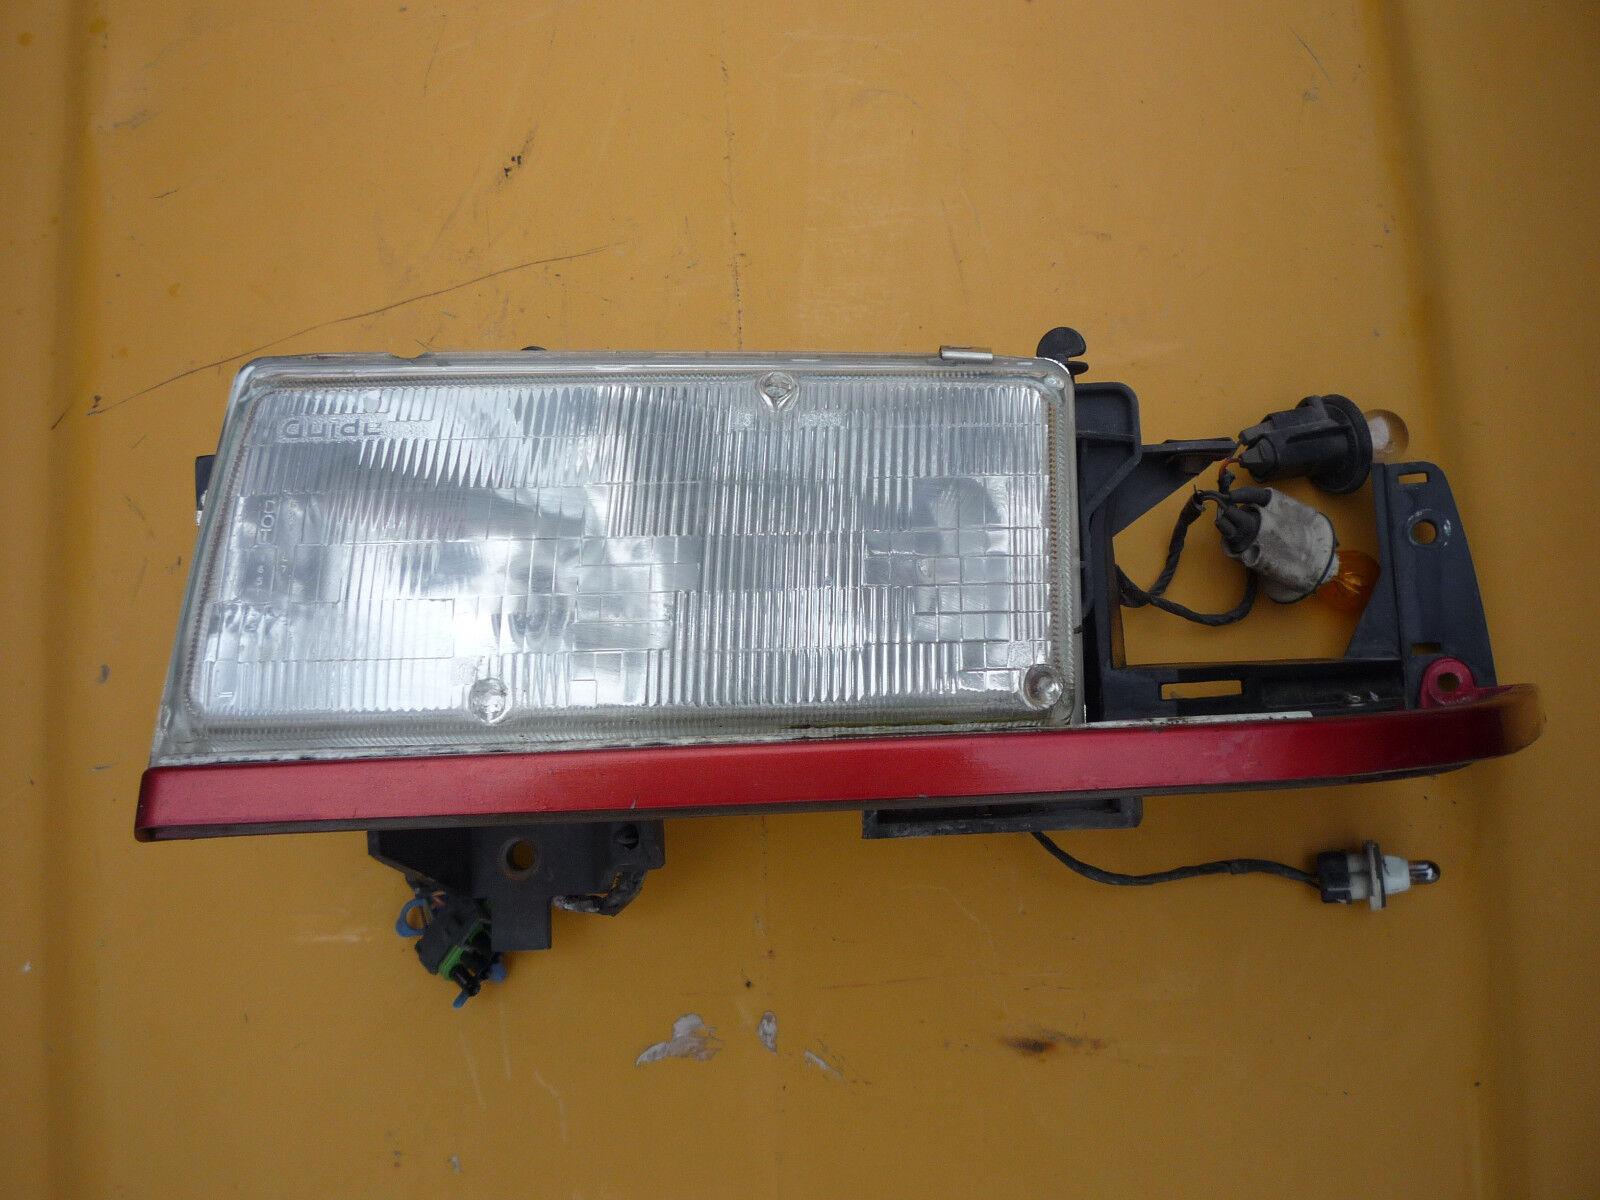 Used Cadillac Eldorado A C And Heater Controls For Sale 1971 El Dorado Headlight Wiring Harness 1992 2002 Driver Side Lh Assembly Oem